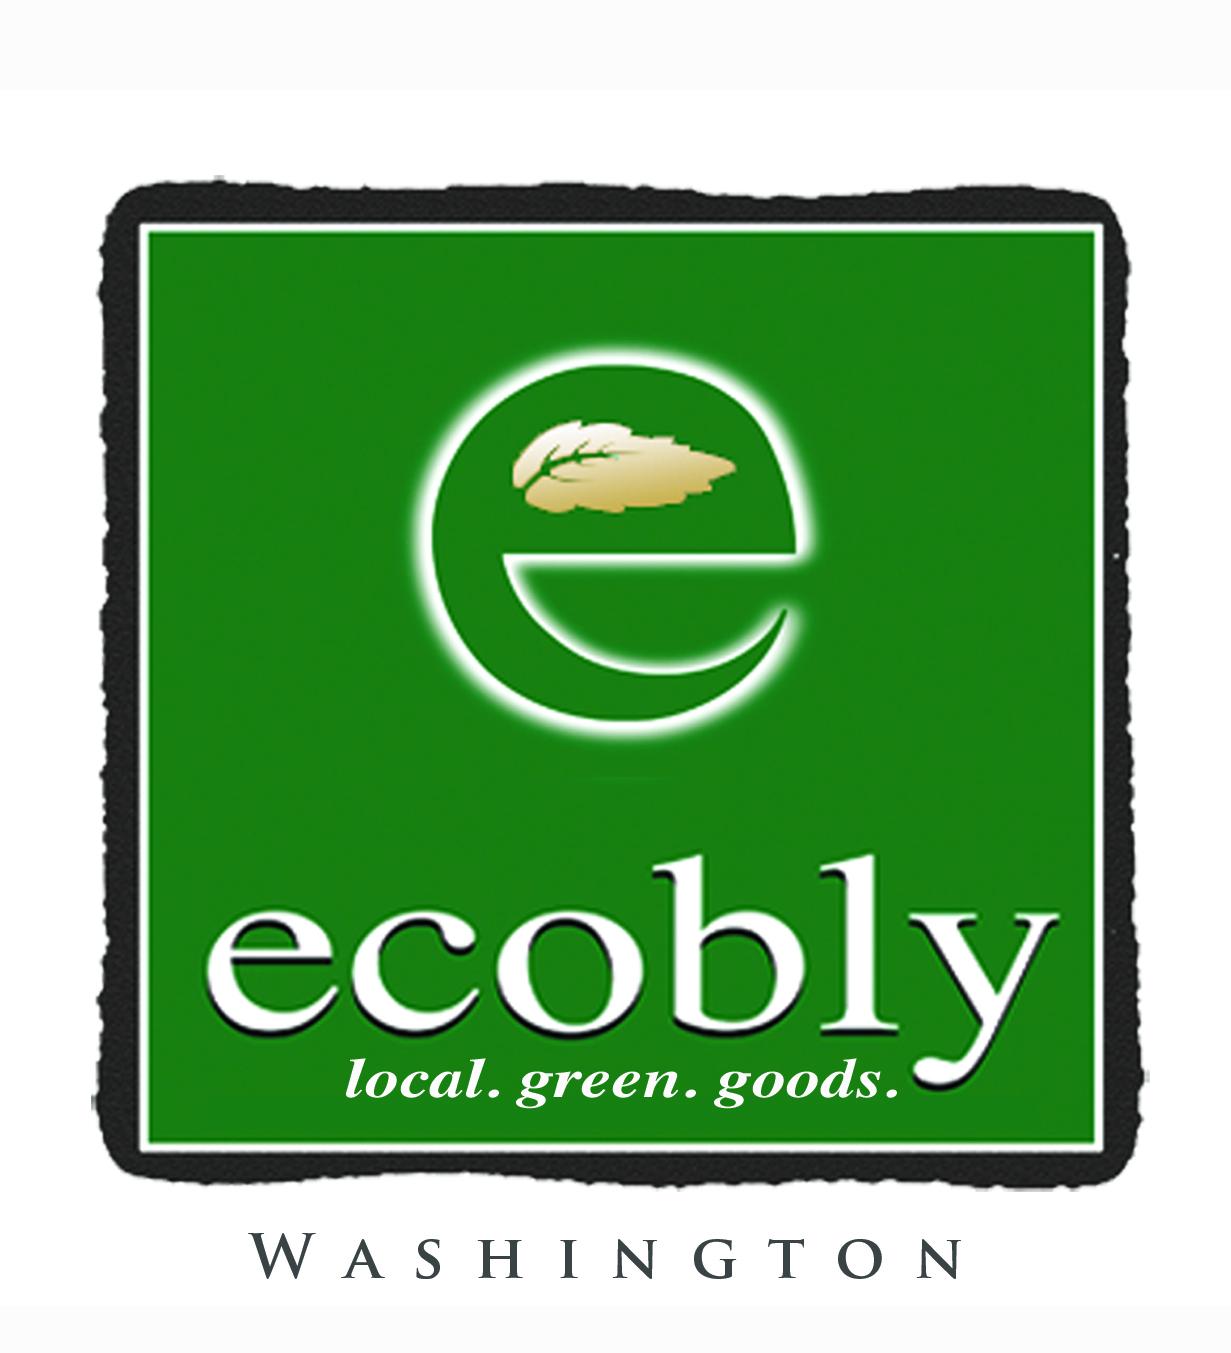 ecobly brand